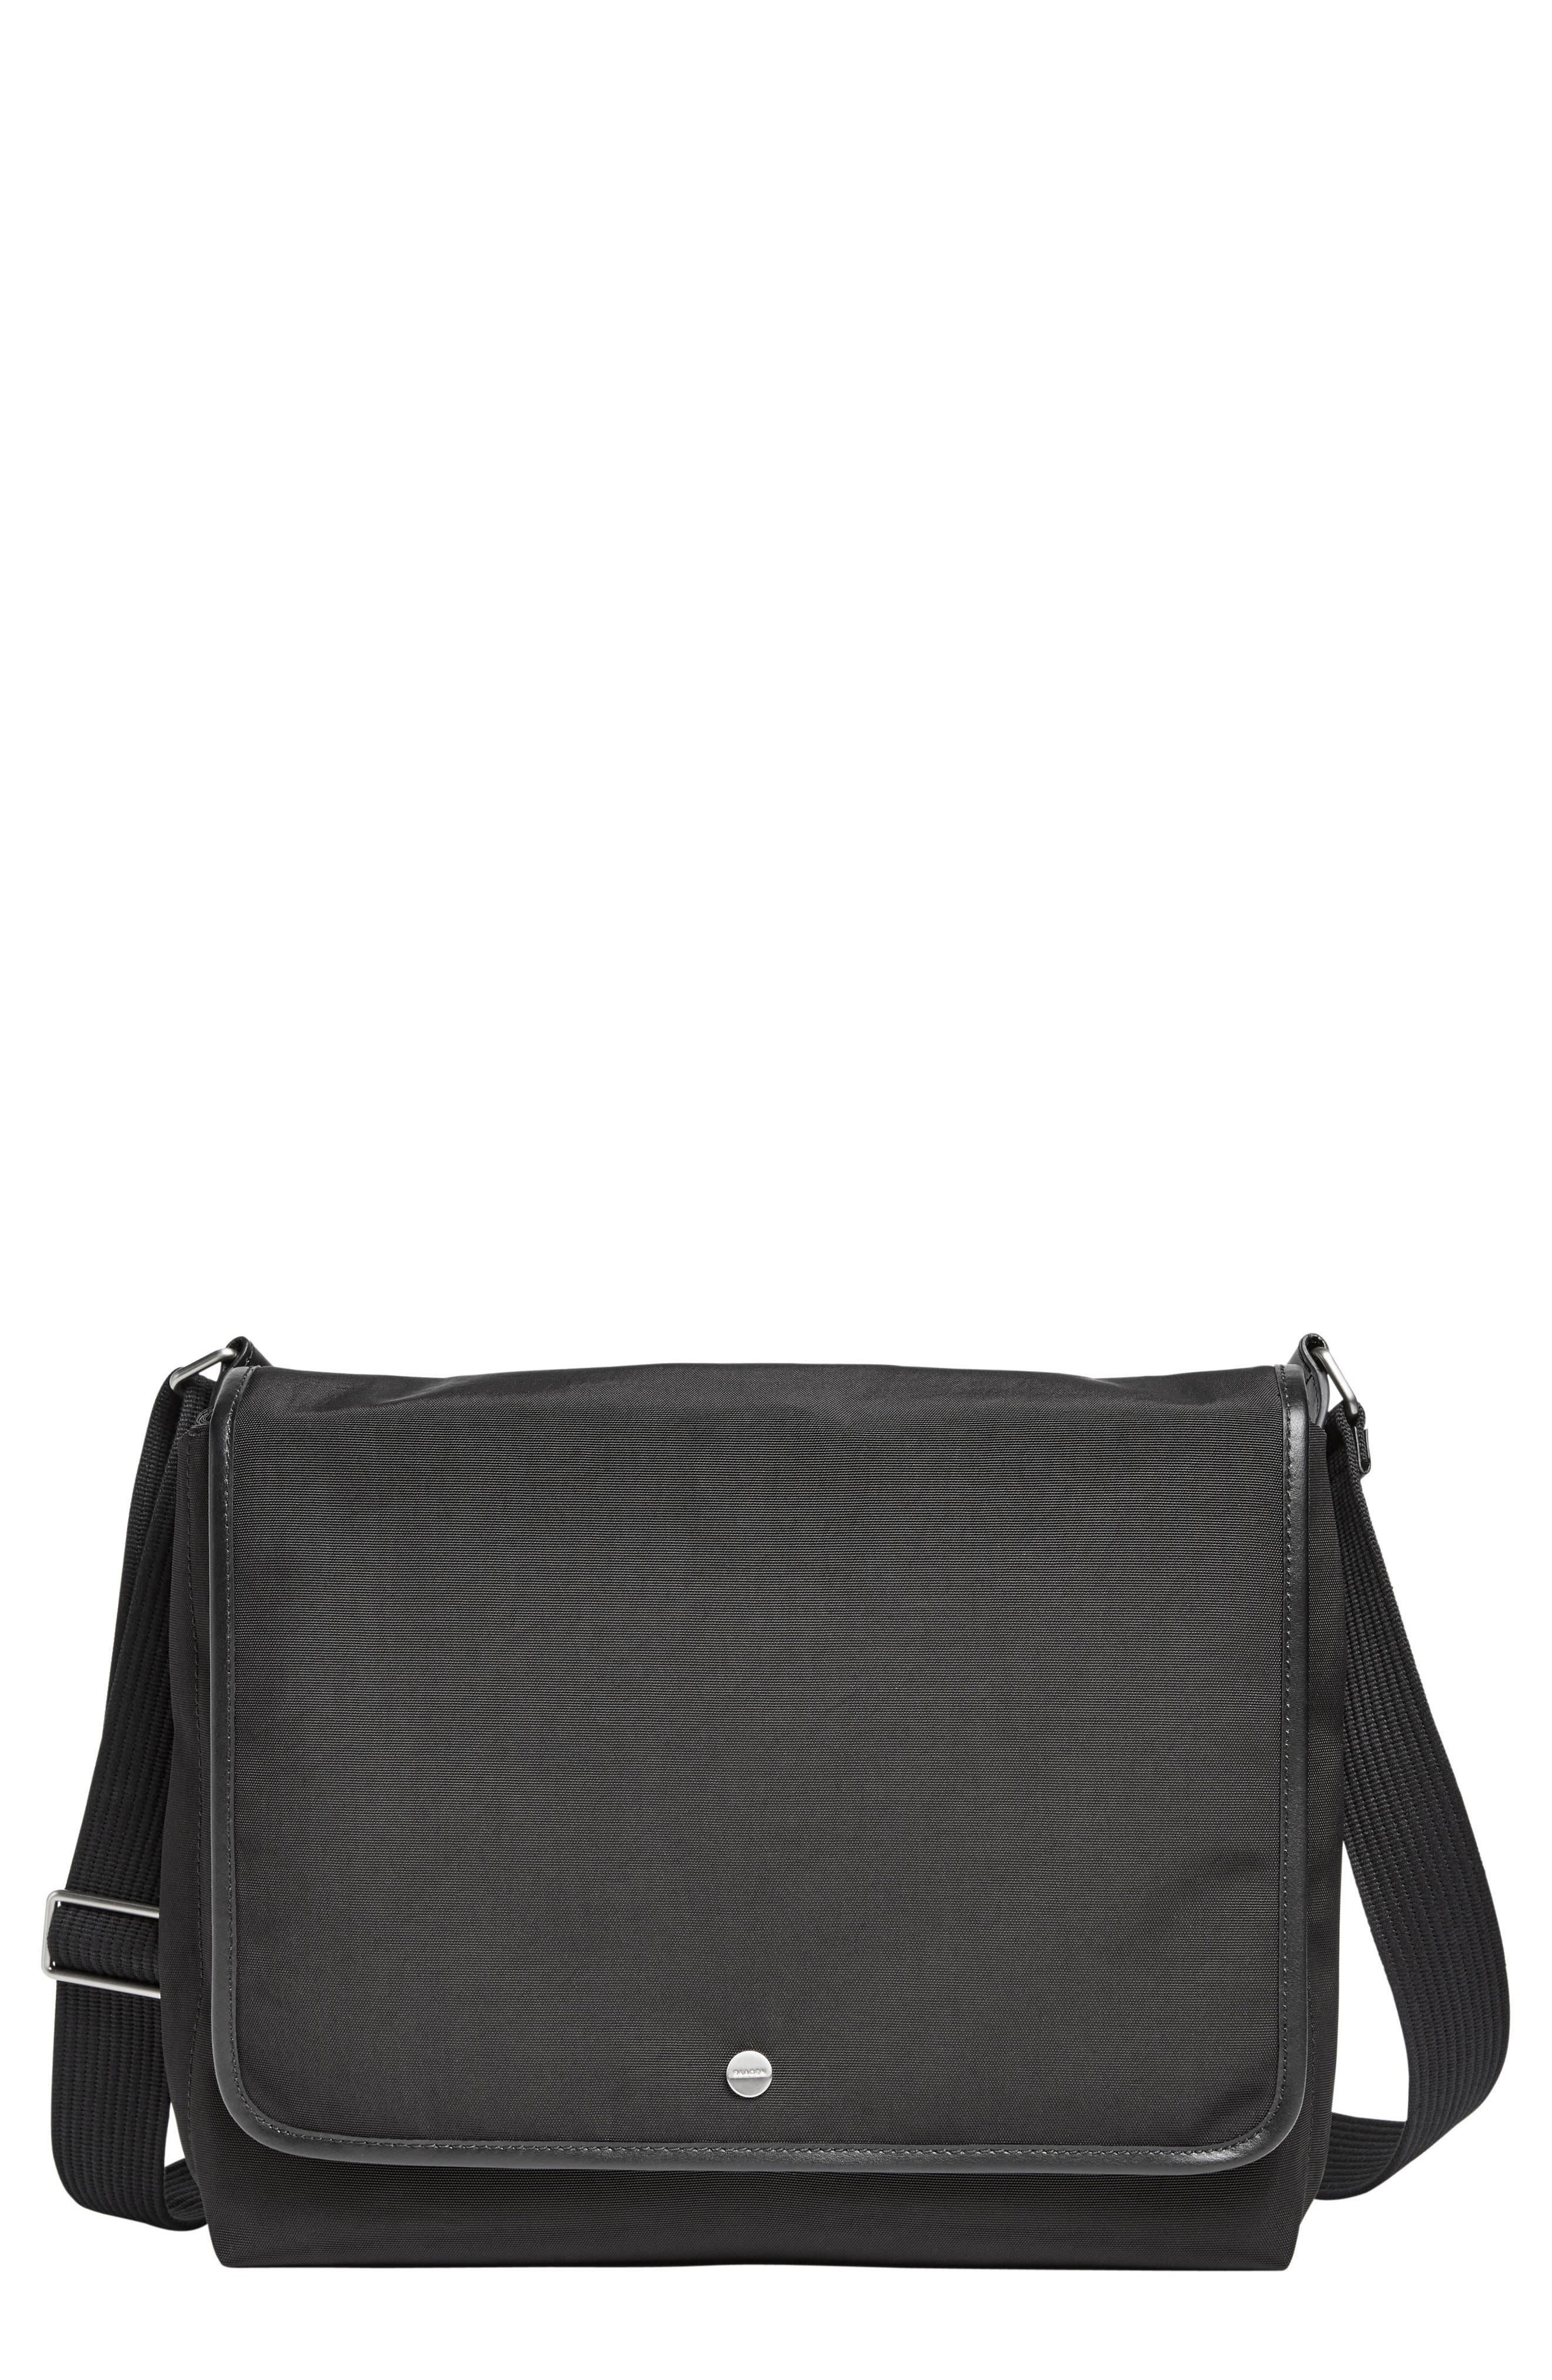 Eric Messenger Bag,                         Main,                         color,